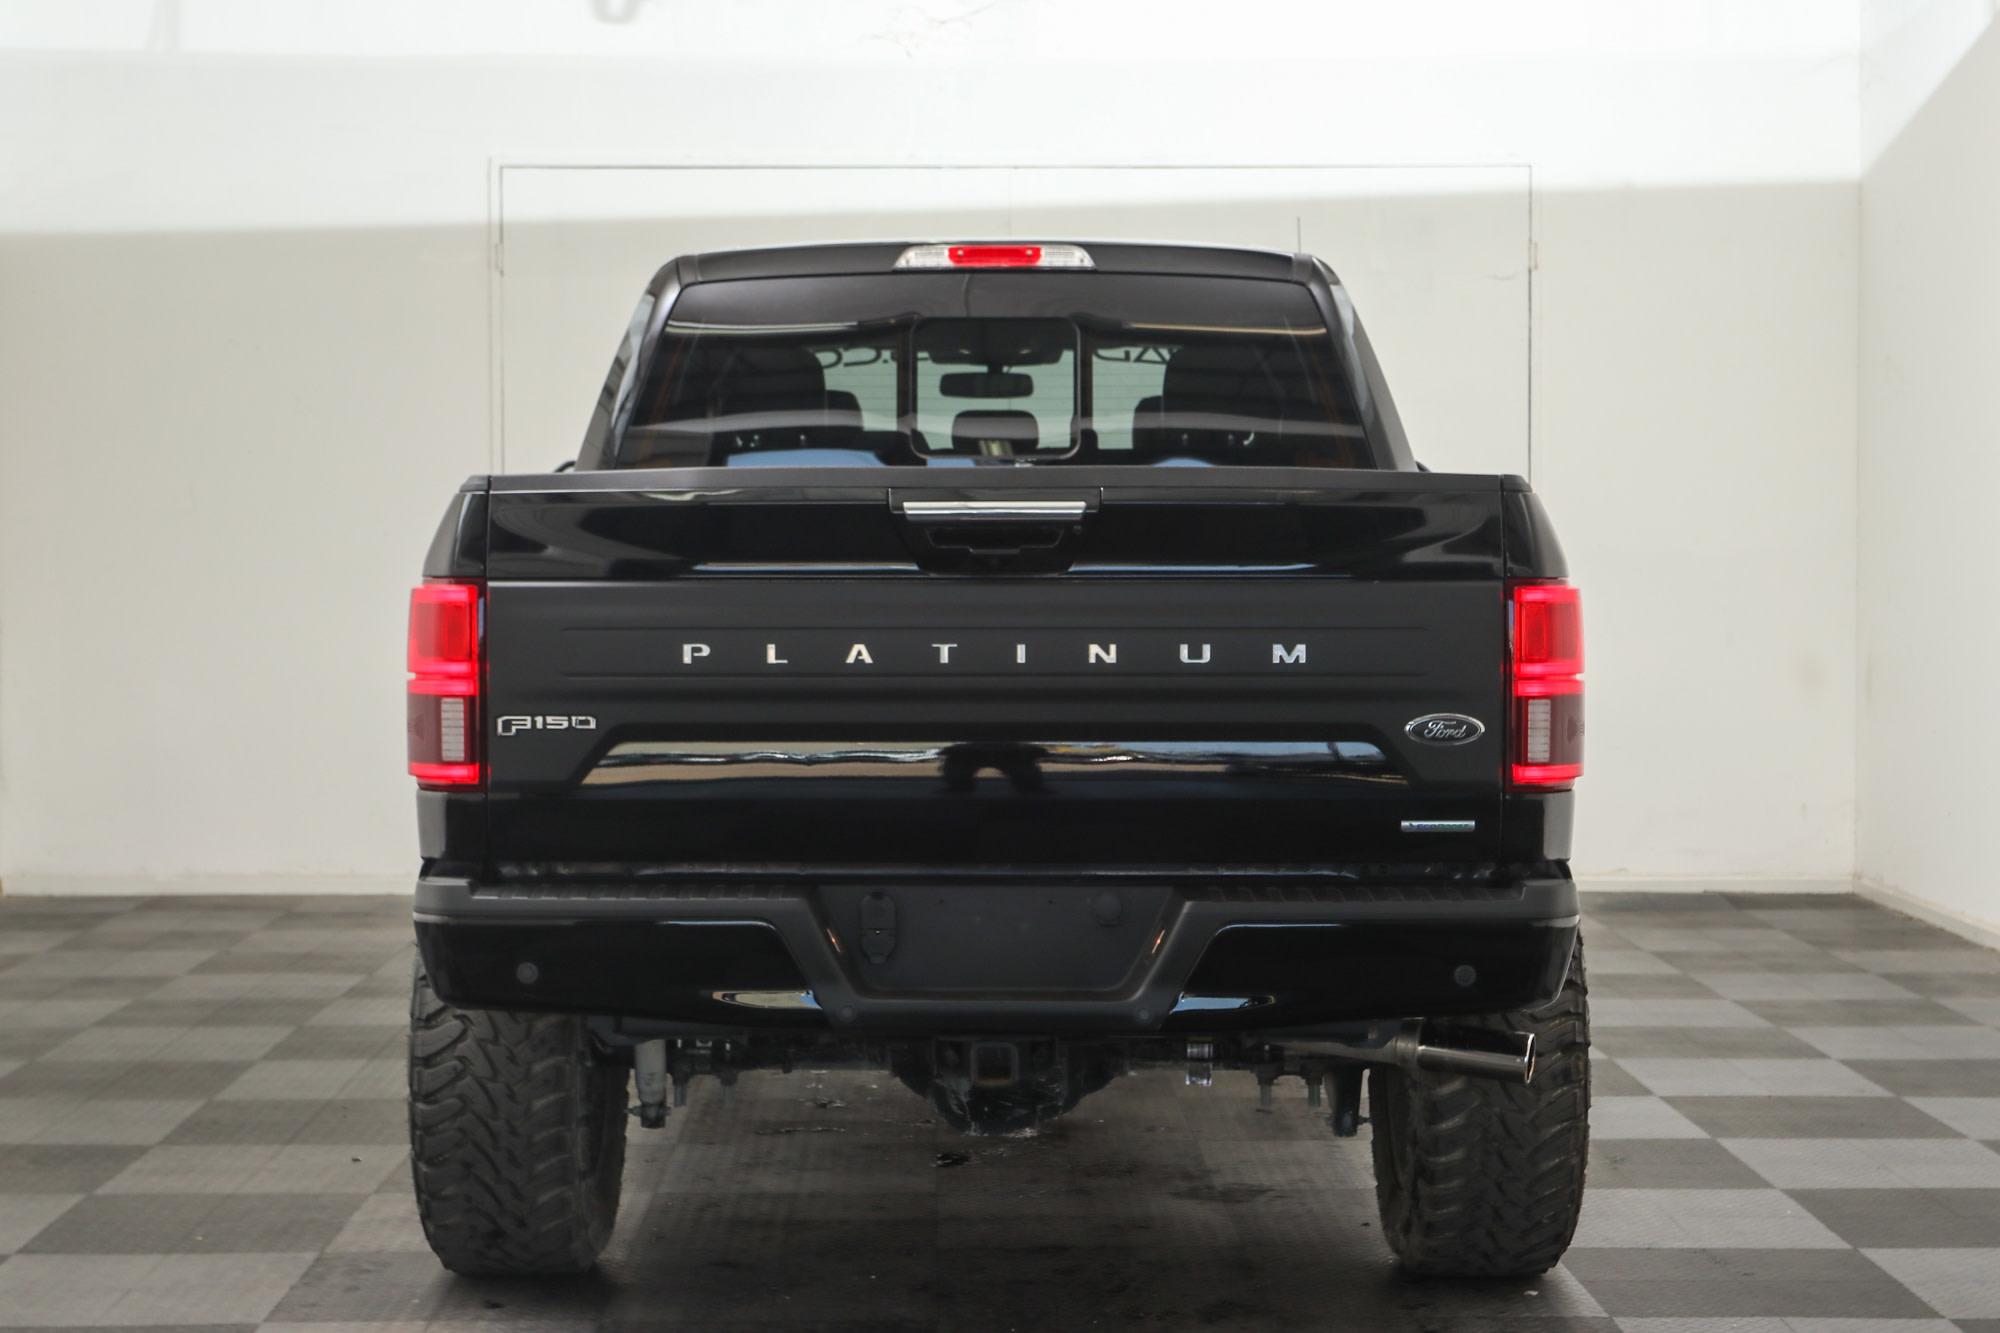 2019 Ford F 150 Platinum Custom Lifted 4x4 Truck Black Fuel Hardline